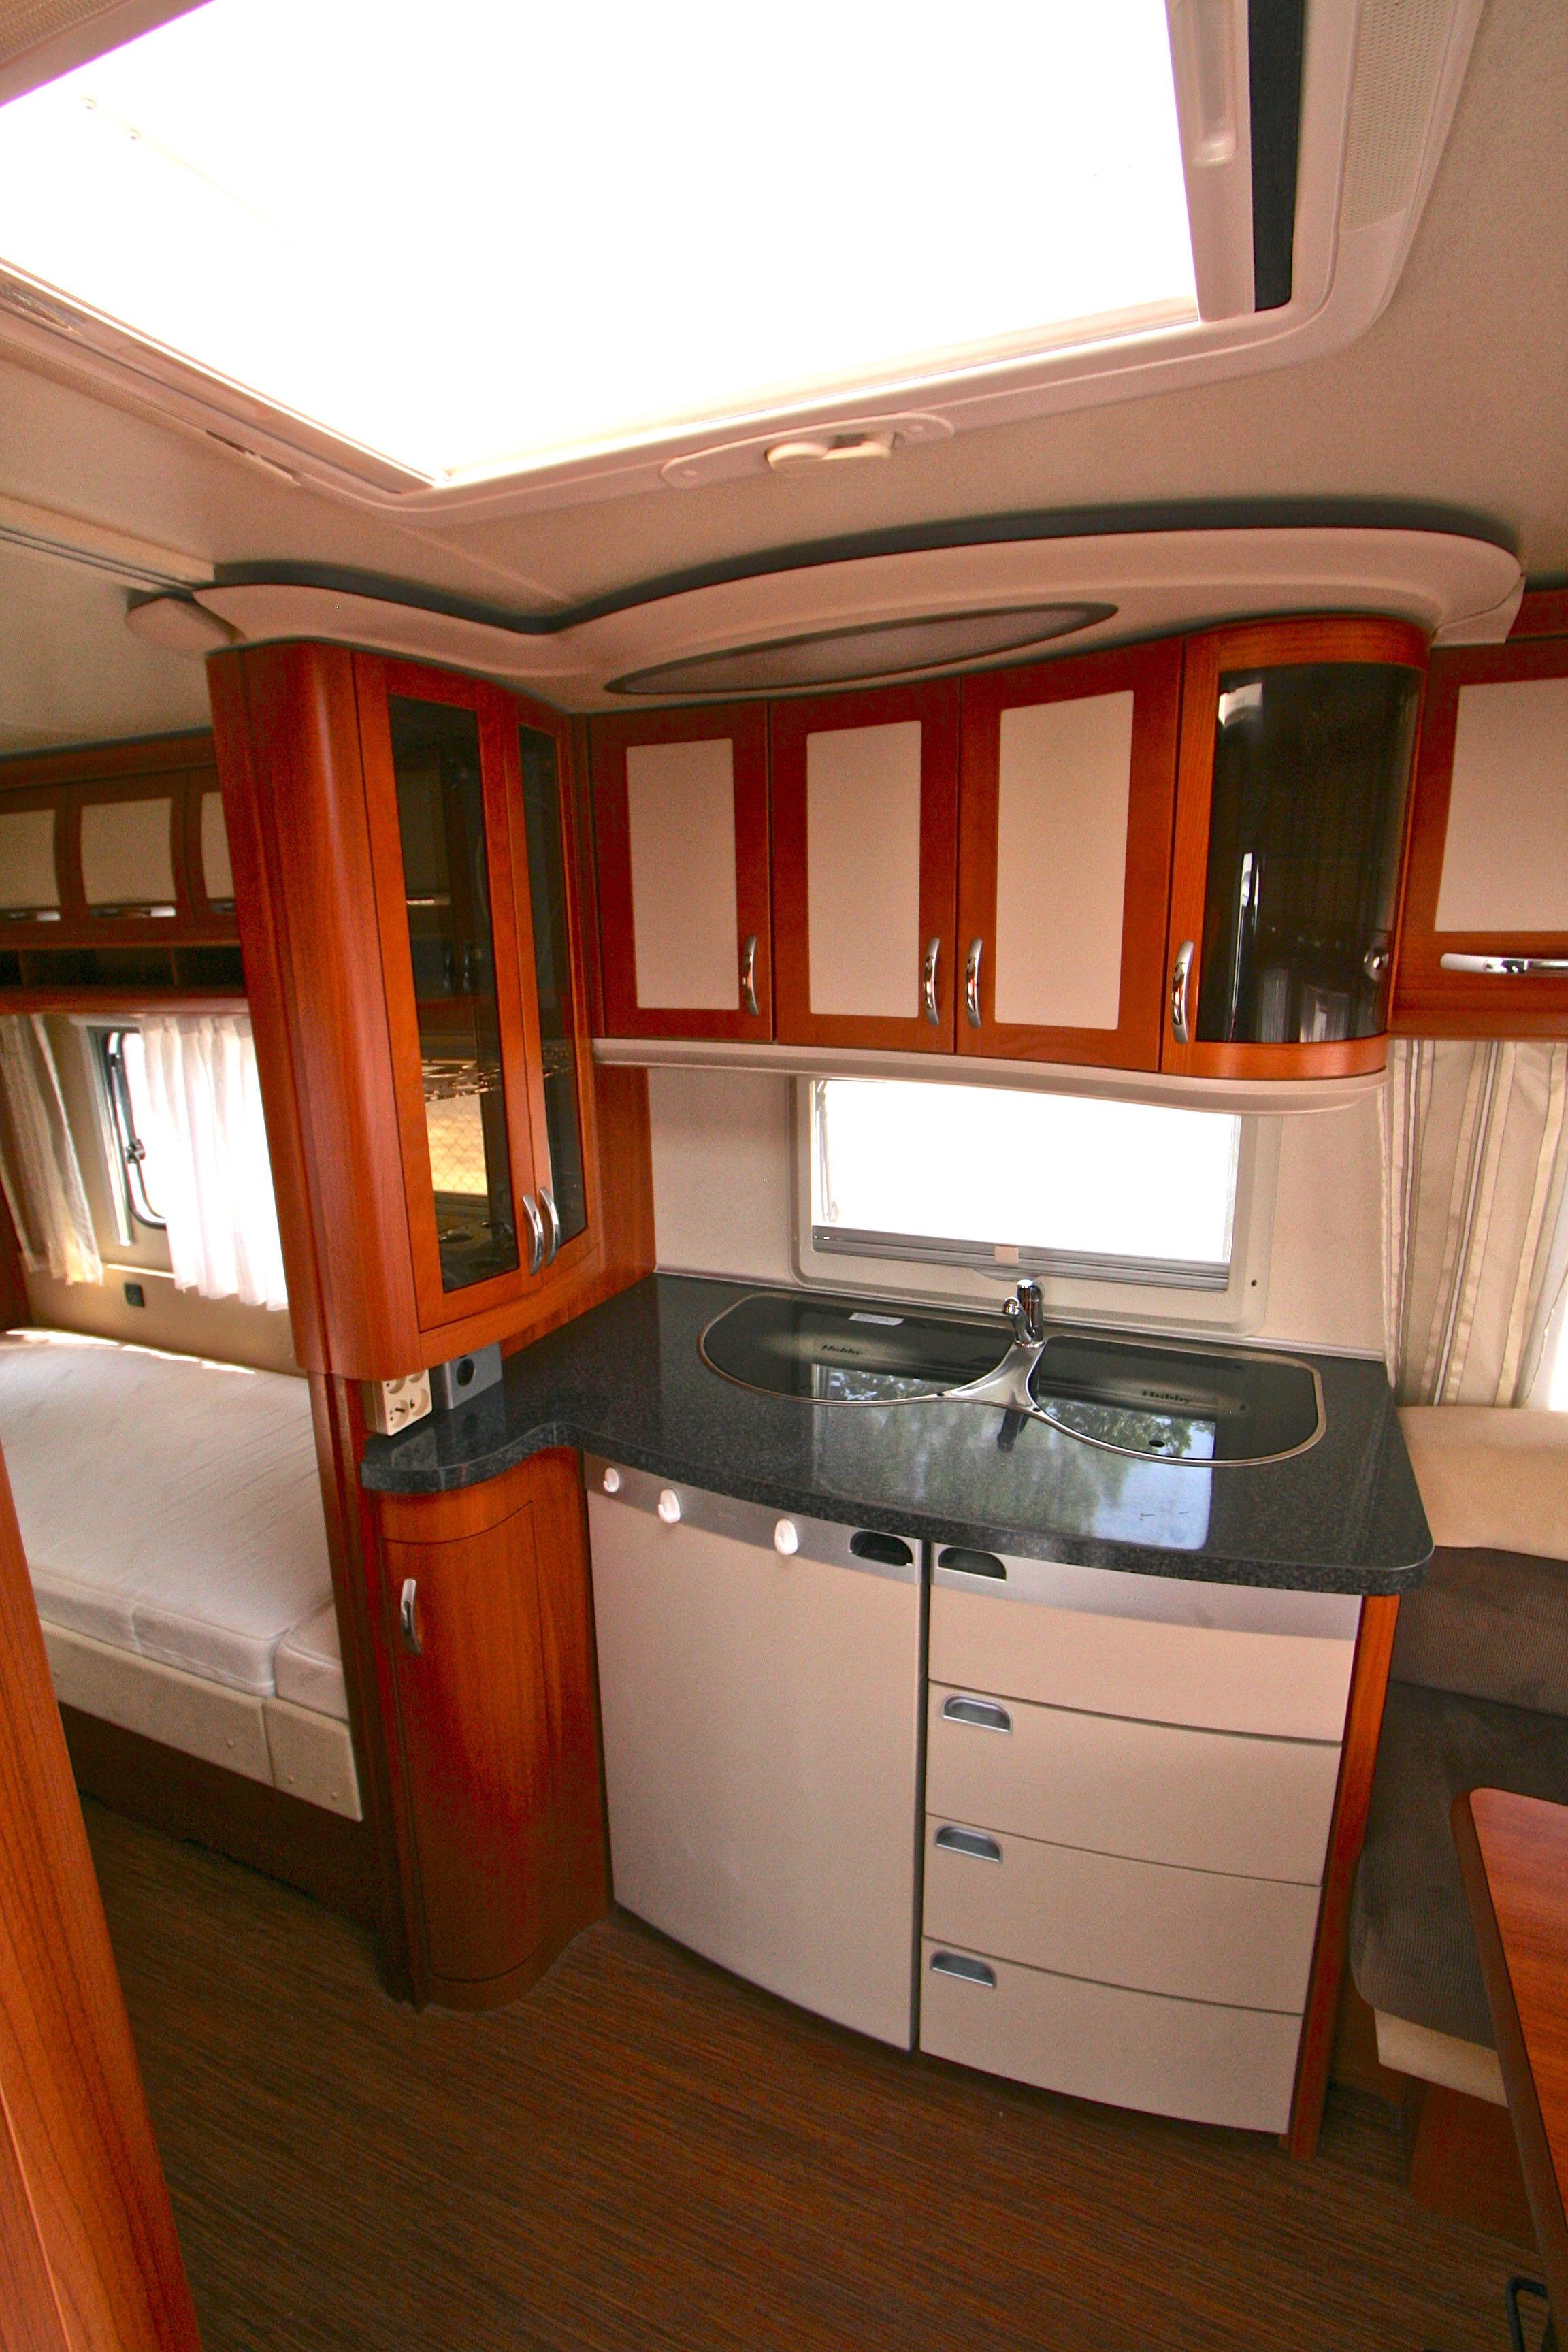 hobby 540 wlu prestige occasion de 2011 caravane en vente roques sur garonne haute garonne. Black Bedroom Furniture Sets. Home Design Ideas